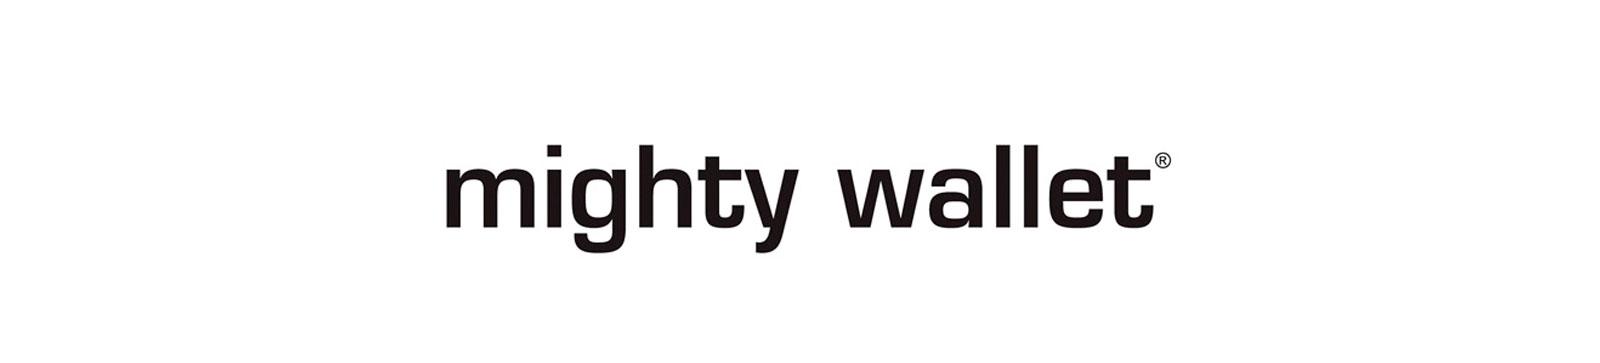 mightywallet_logo.jpg